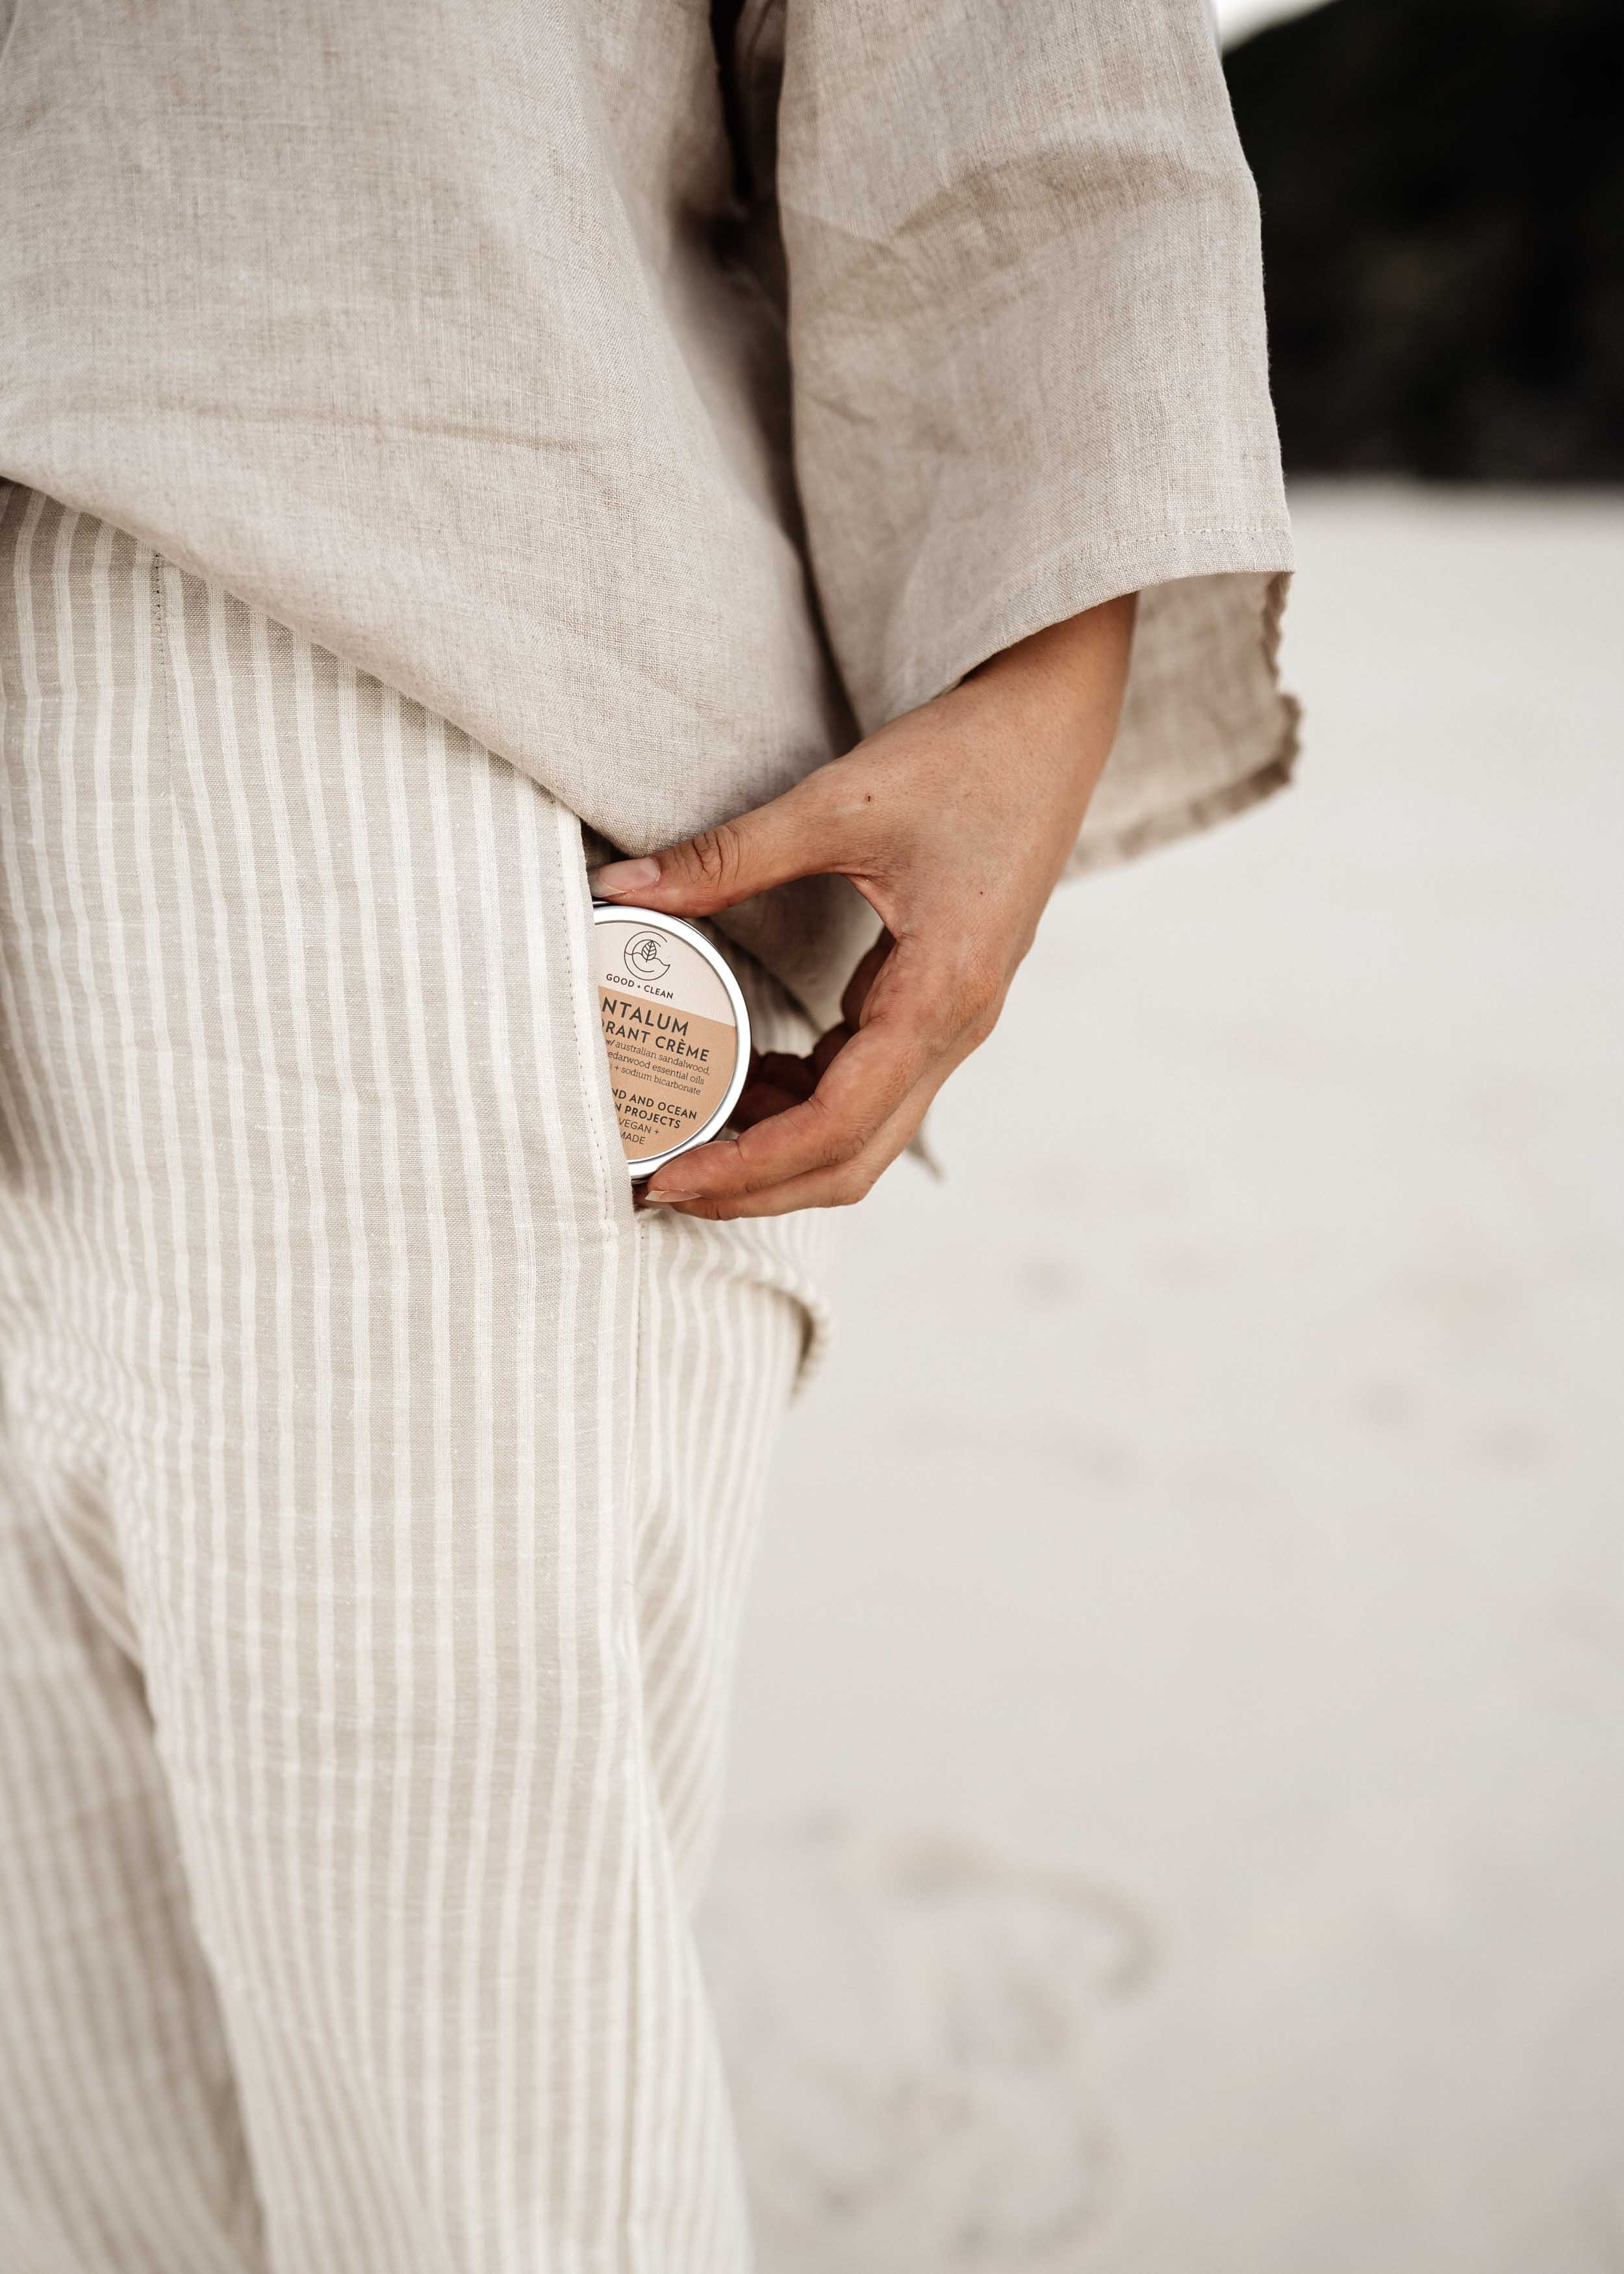 keira-mason-good-and-clean-beach-pocket-natrual-deodorant.jpg